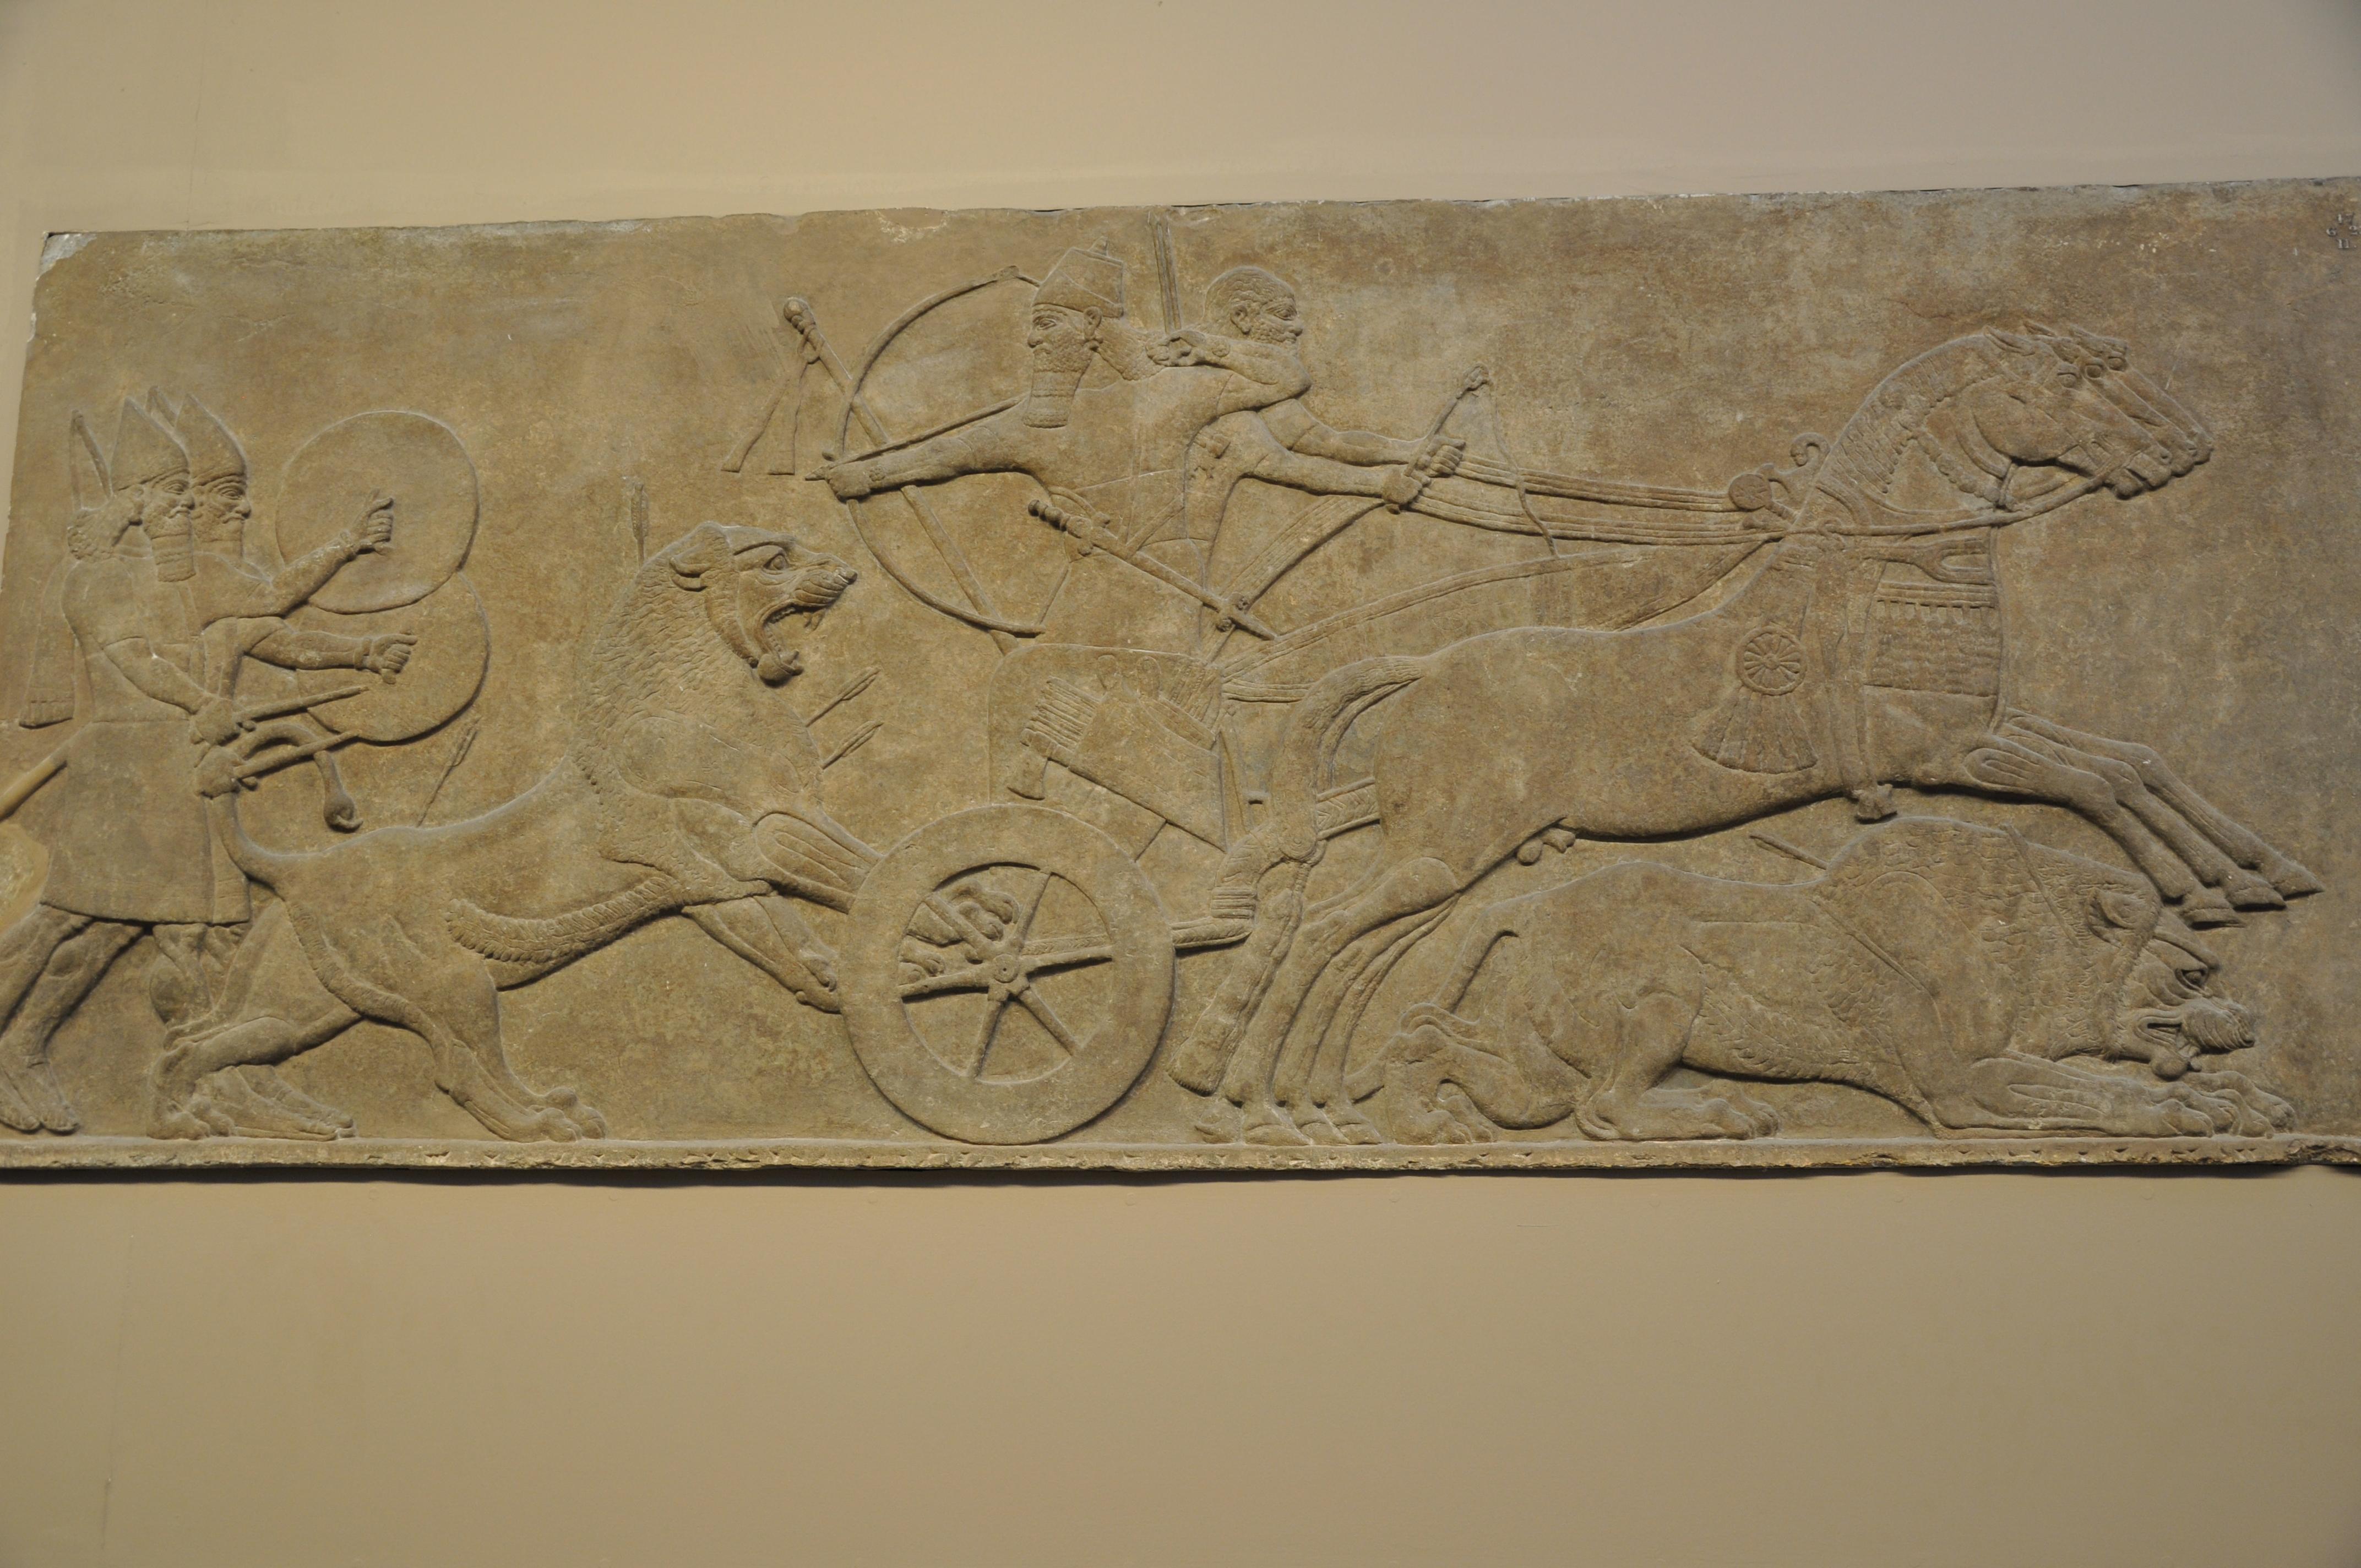 https://upload.wikimedia.org/wikipedia/commons/0/05/Assyrian_Reliefs_Nimrod_North_West_Palace_-_War_Scene.JPG